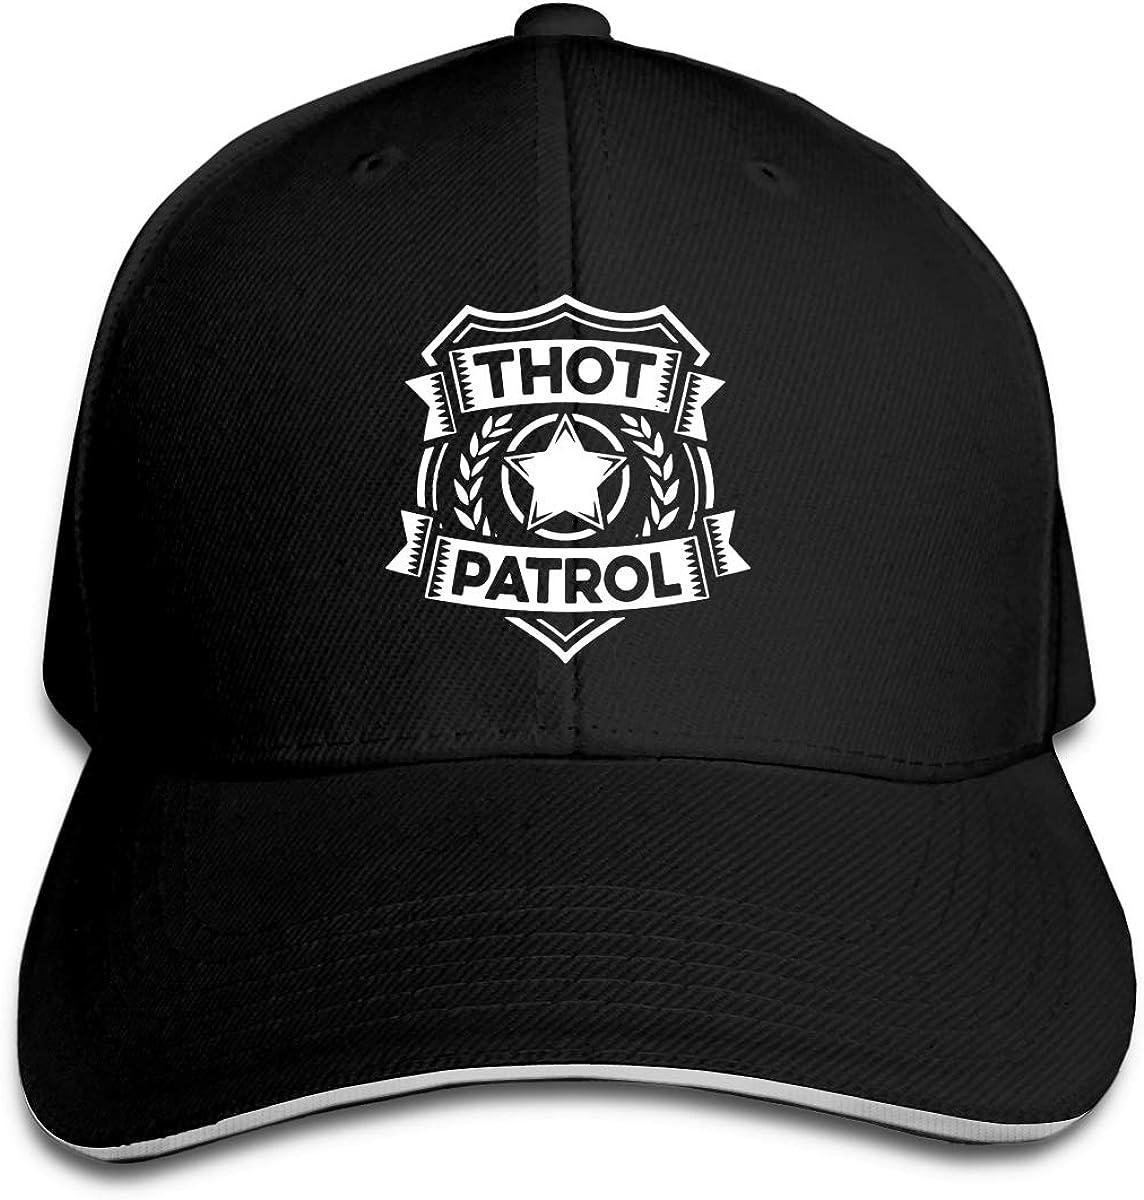 Thot Patrol Is On The Case Denim Dad Cap Baseball Hat Adjustable Sun Cap Hip Pop Hat